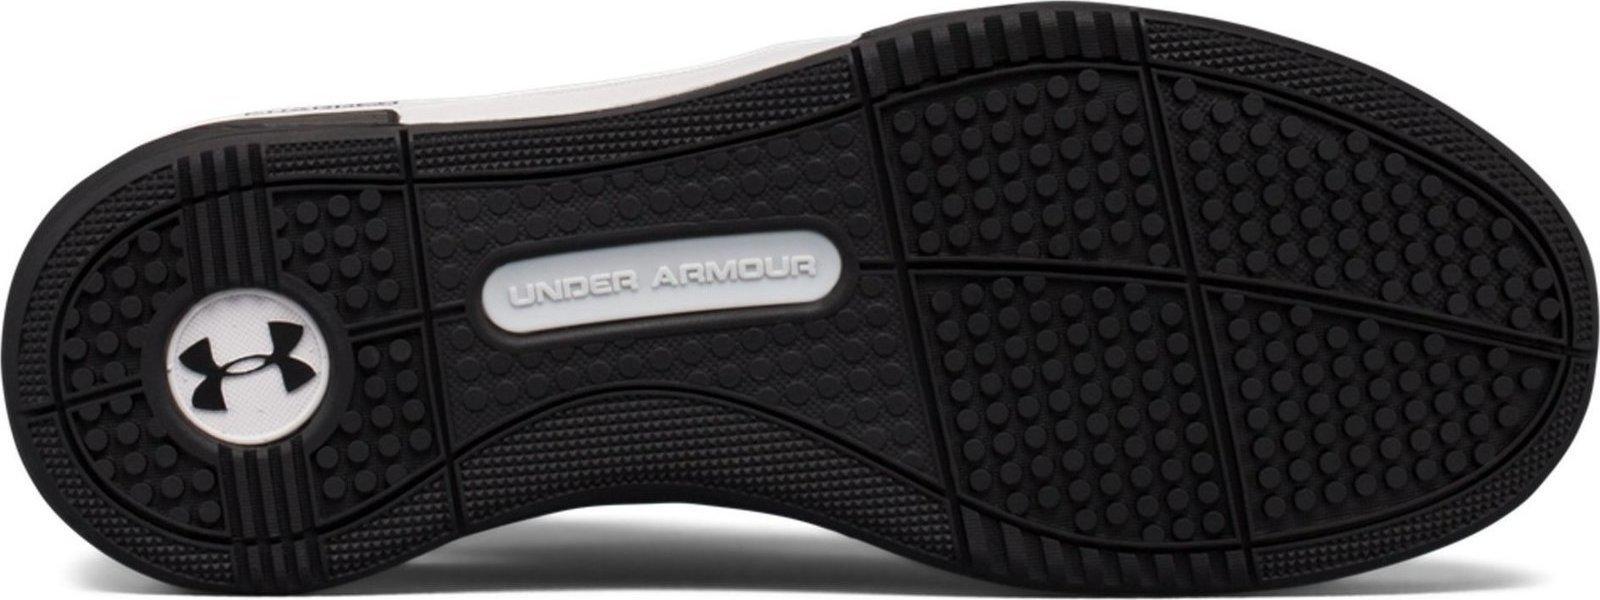 Under Armour Charged Legend 1293035-003 - Skroutz.gr 4ad7efc6ea3